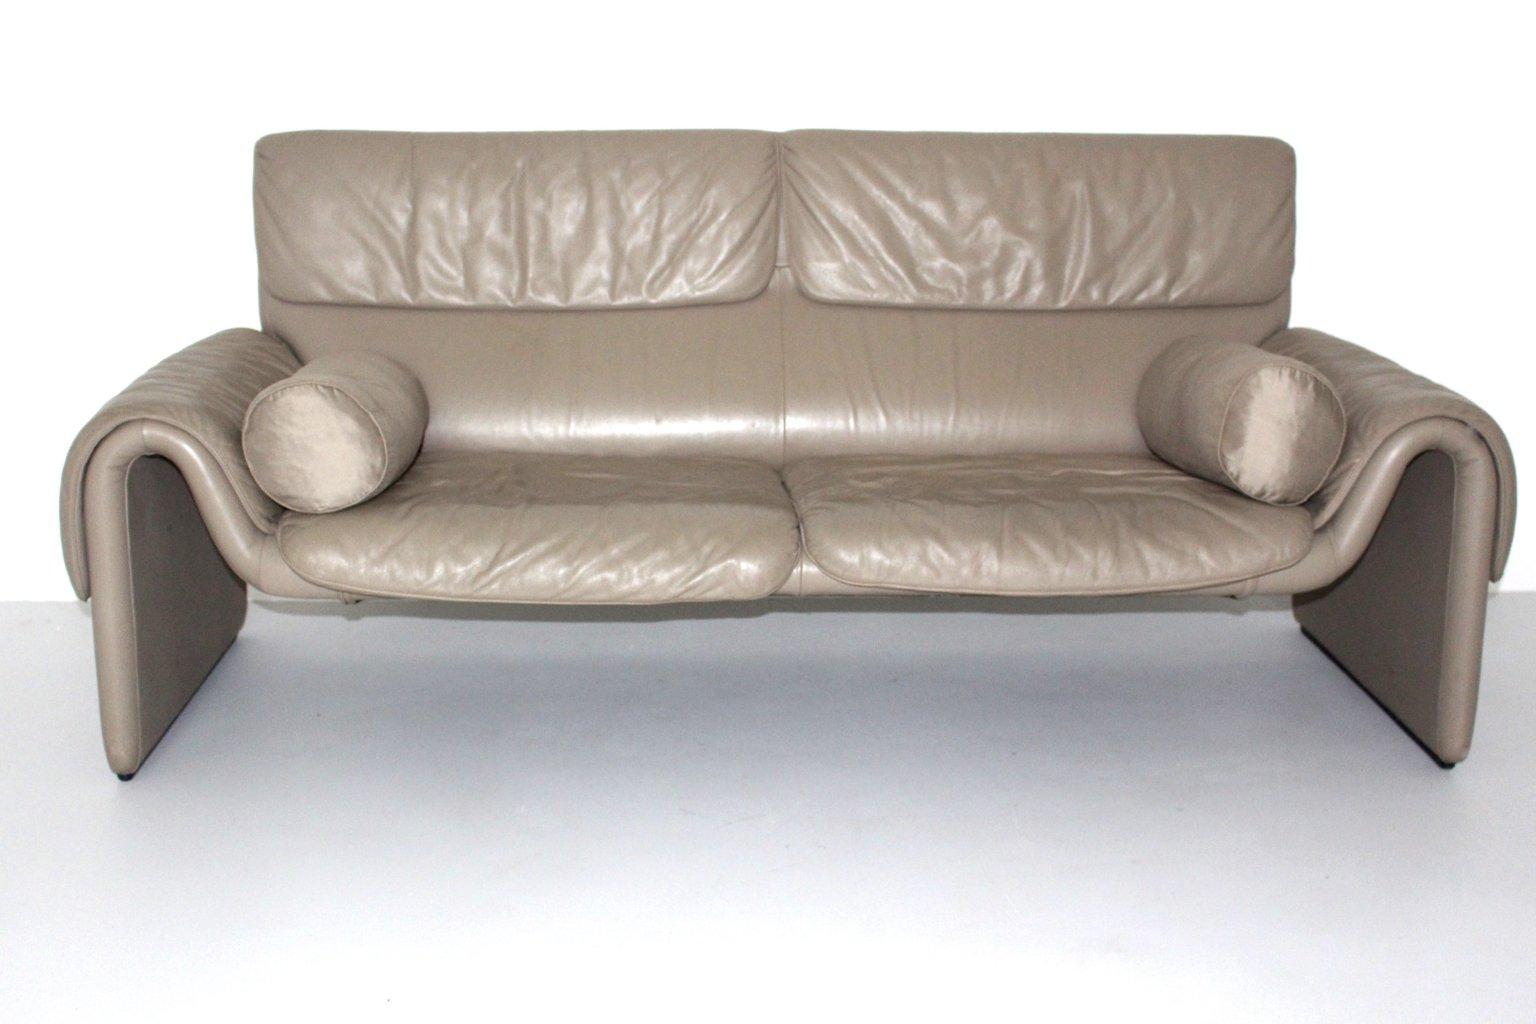 de sede sofa vintage leather repair san antonio ds 2011 from 1980s for sale